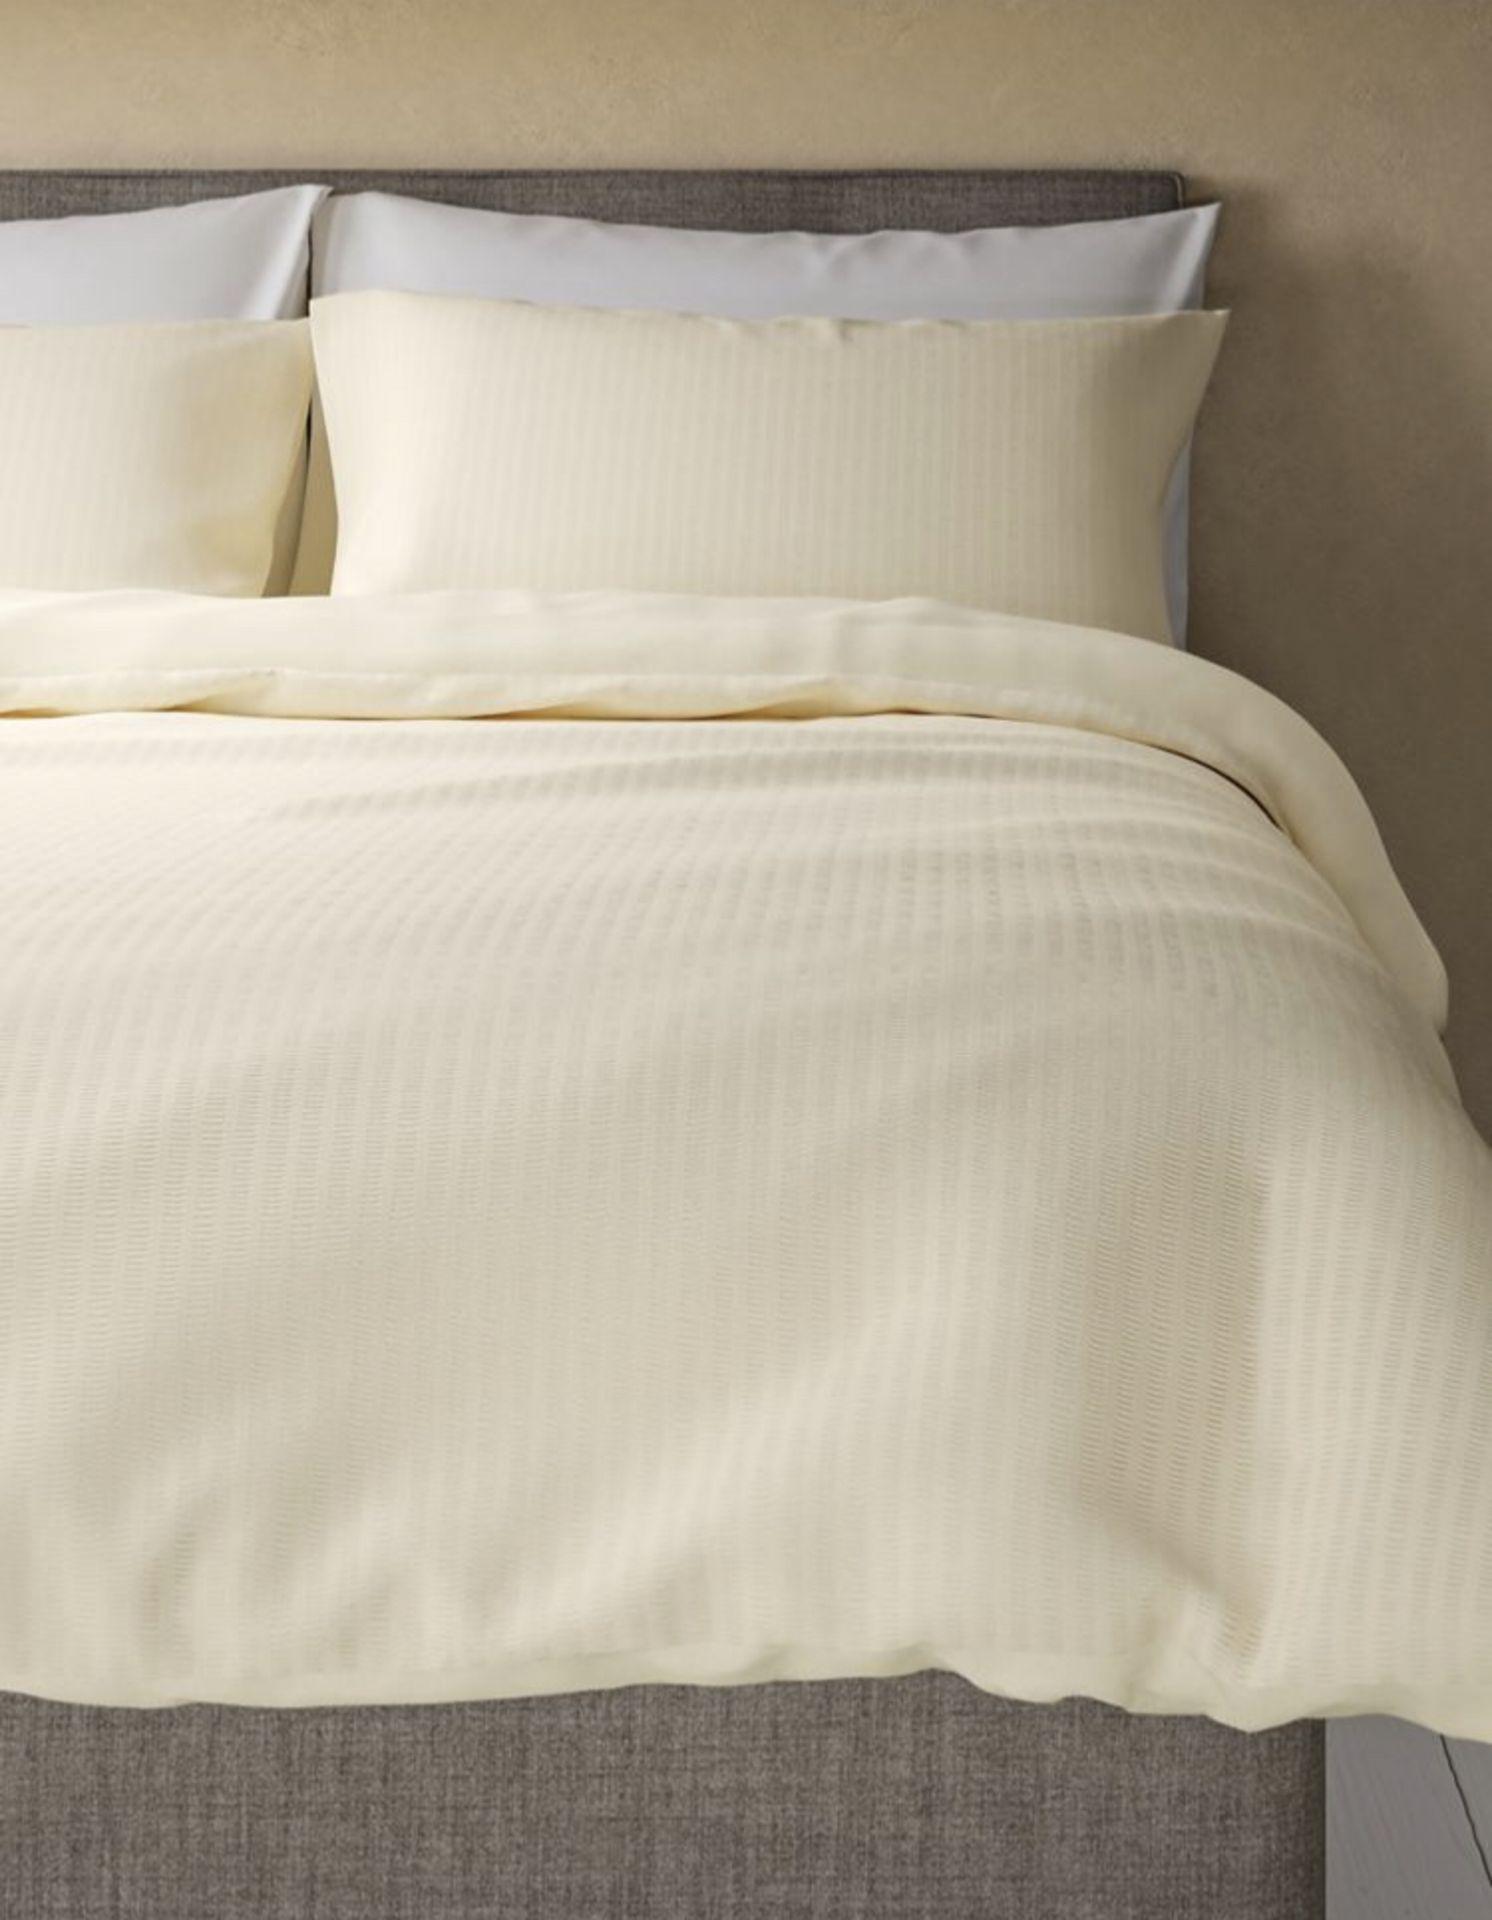 Lot 57 - Cotton Rich Seersucker Bedding Set, King Size